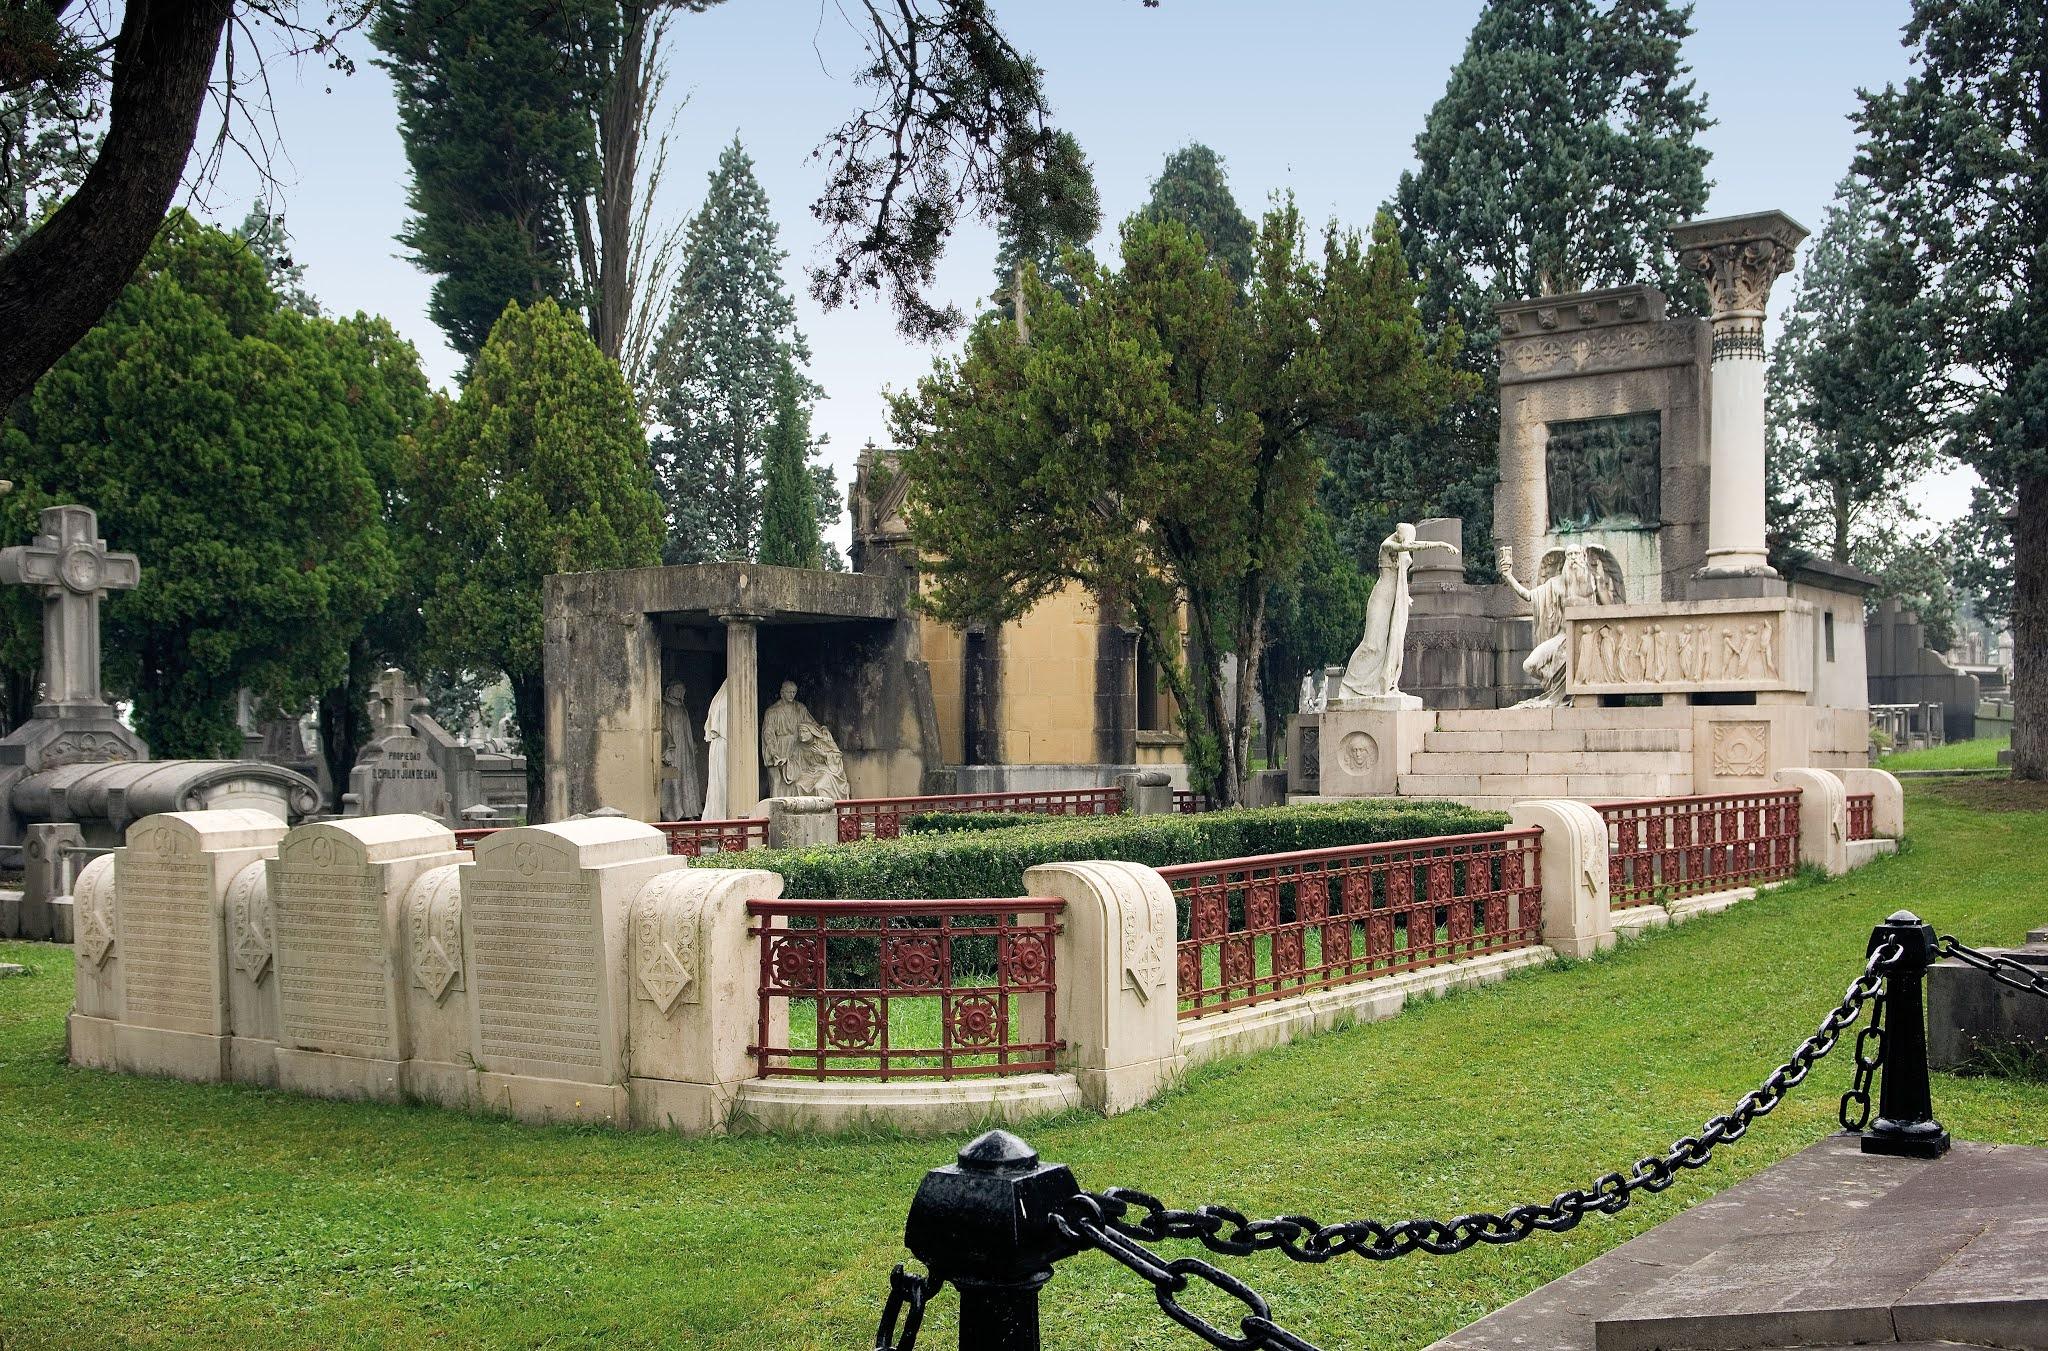 Cemetery of Bilbao (Bilbao, Spain)